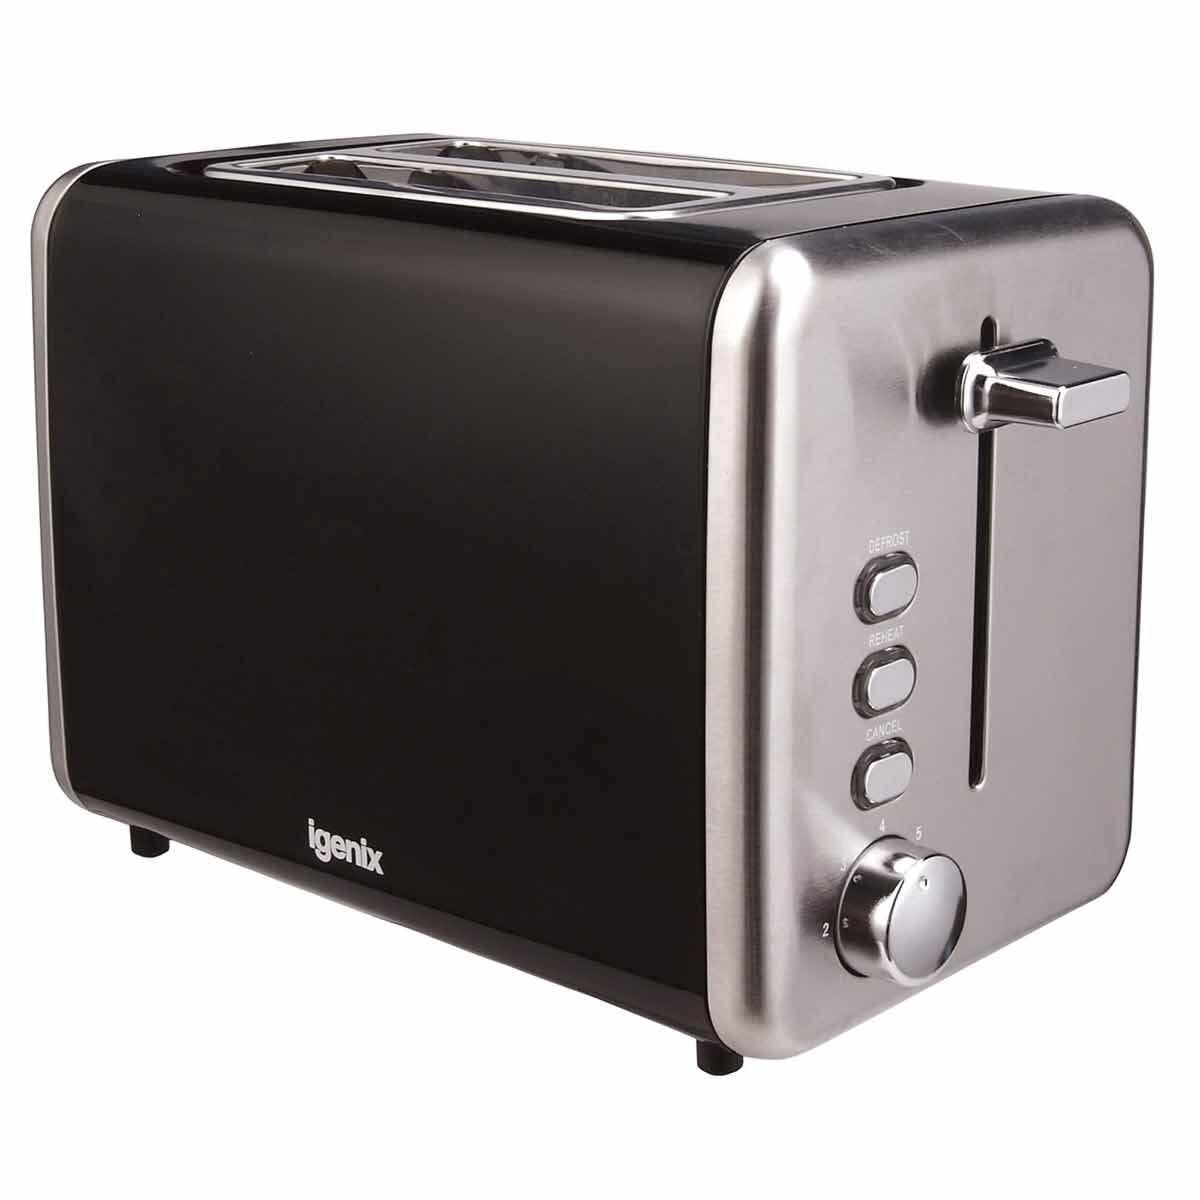 Igenix 2 Slice Toaster with Stainless Steel Black